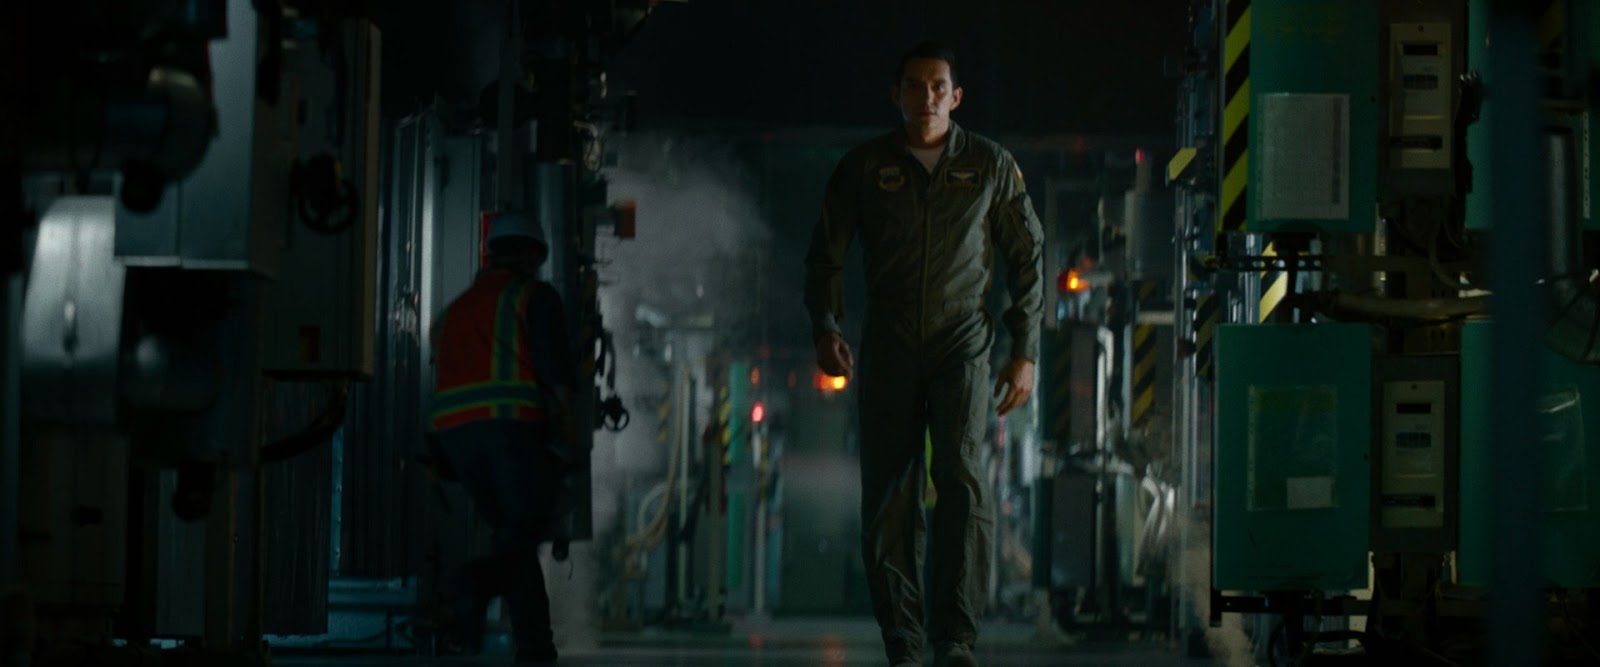 Terminator+Destino+oculto+%282019%29+HD+1080p+WEB-DL+AMZN+Latino+-+Ingles+-+Descargatepelis.com.mkv_snapshot_01.45.16_%5B2020.01.14_02.46.12%5D.jpg (1600×667)